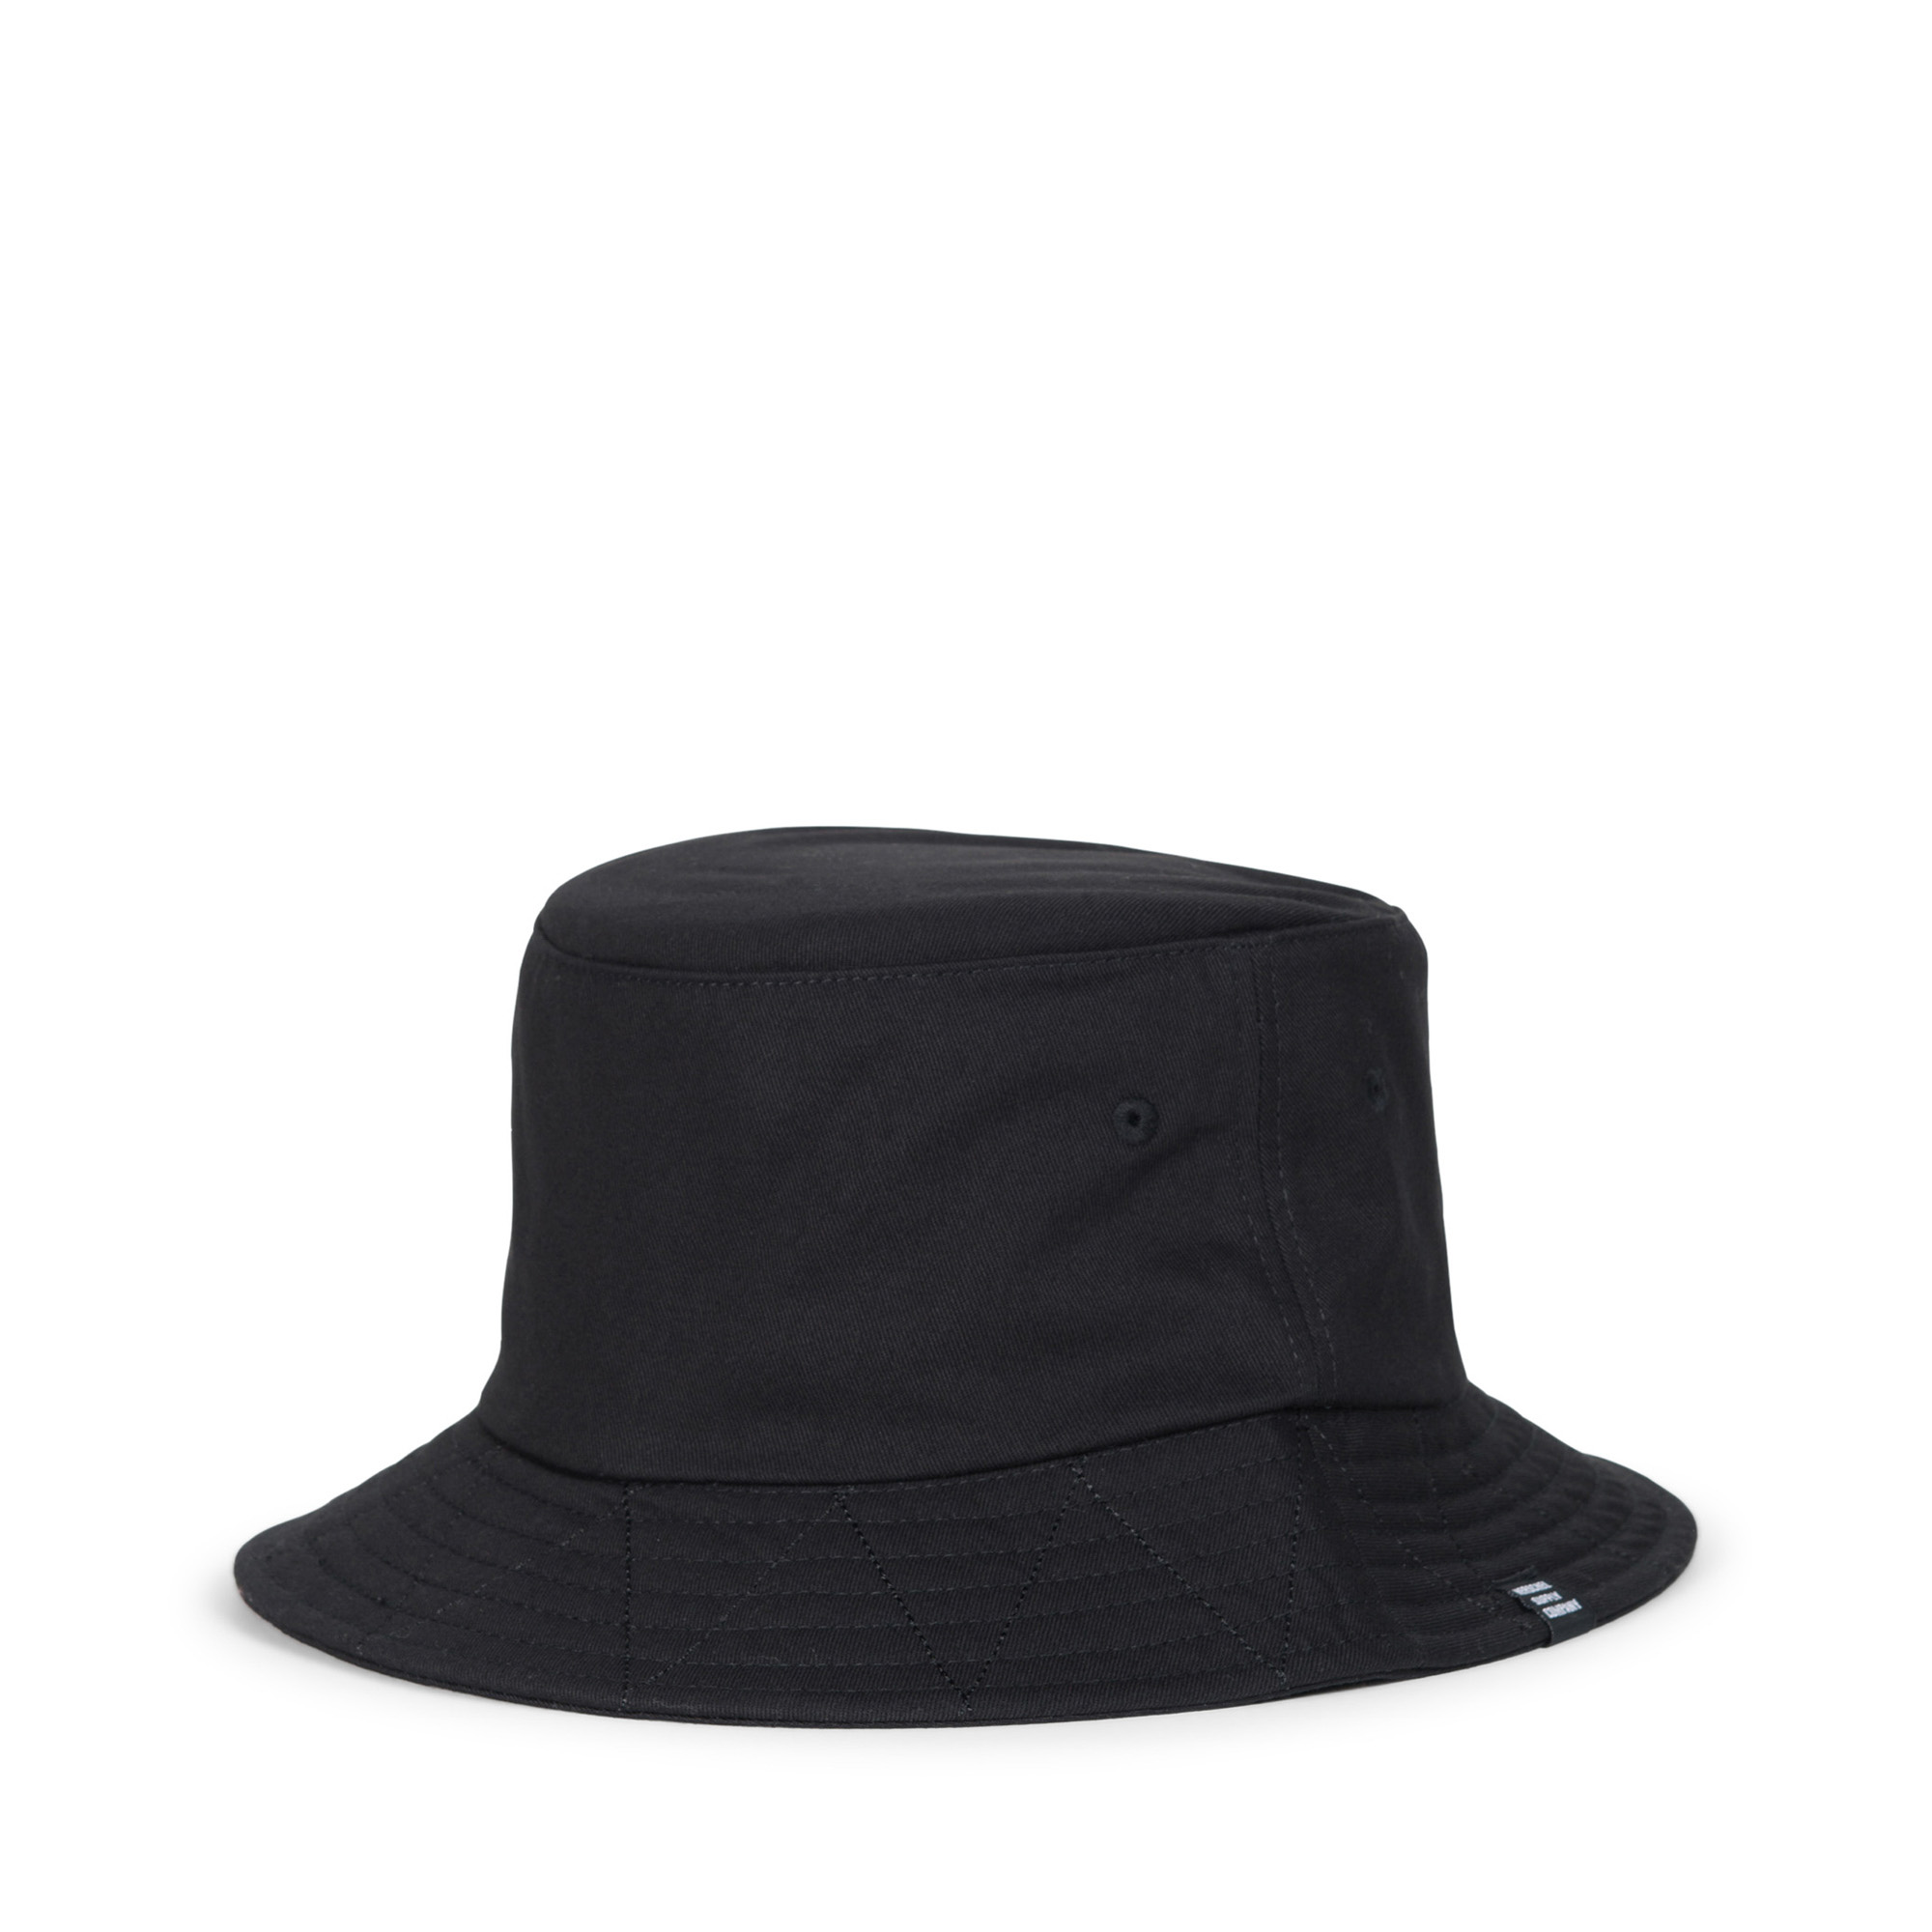 40c26f7cc Lake Bucket Hat | Herschel Supply Company